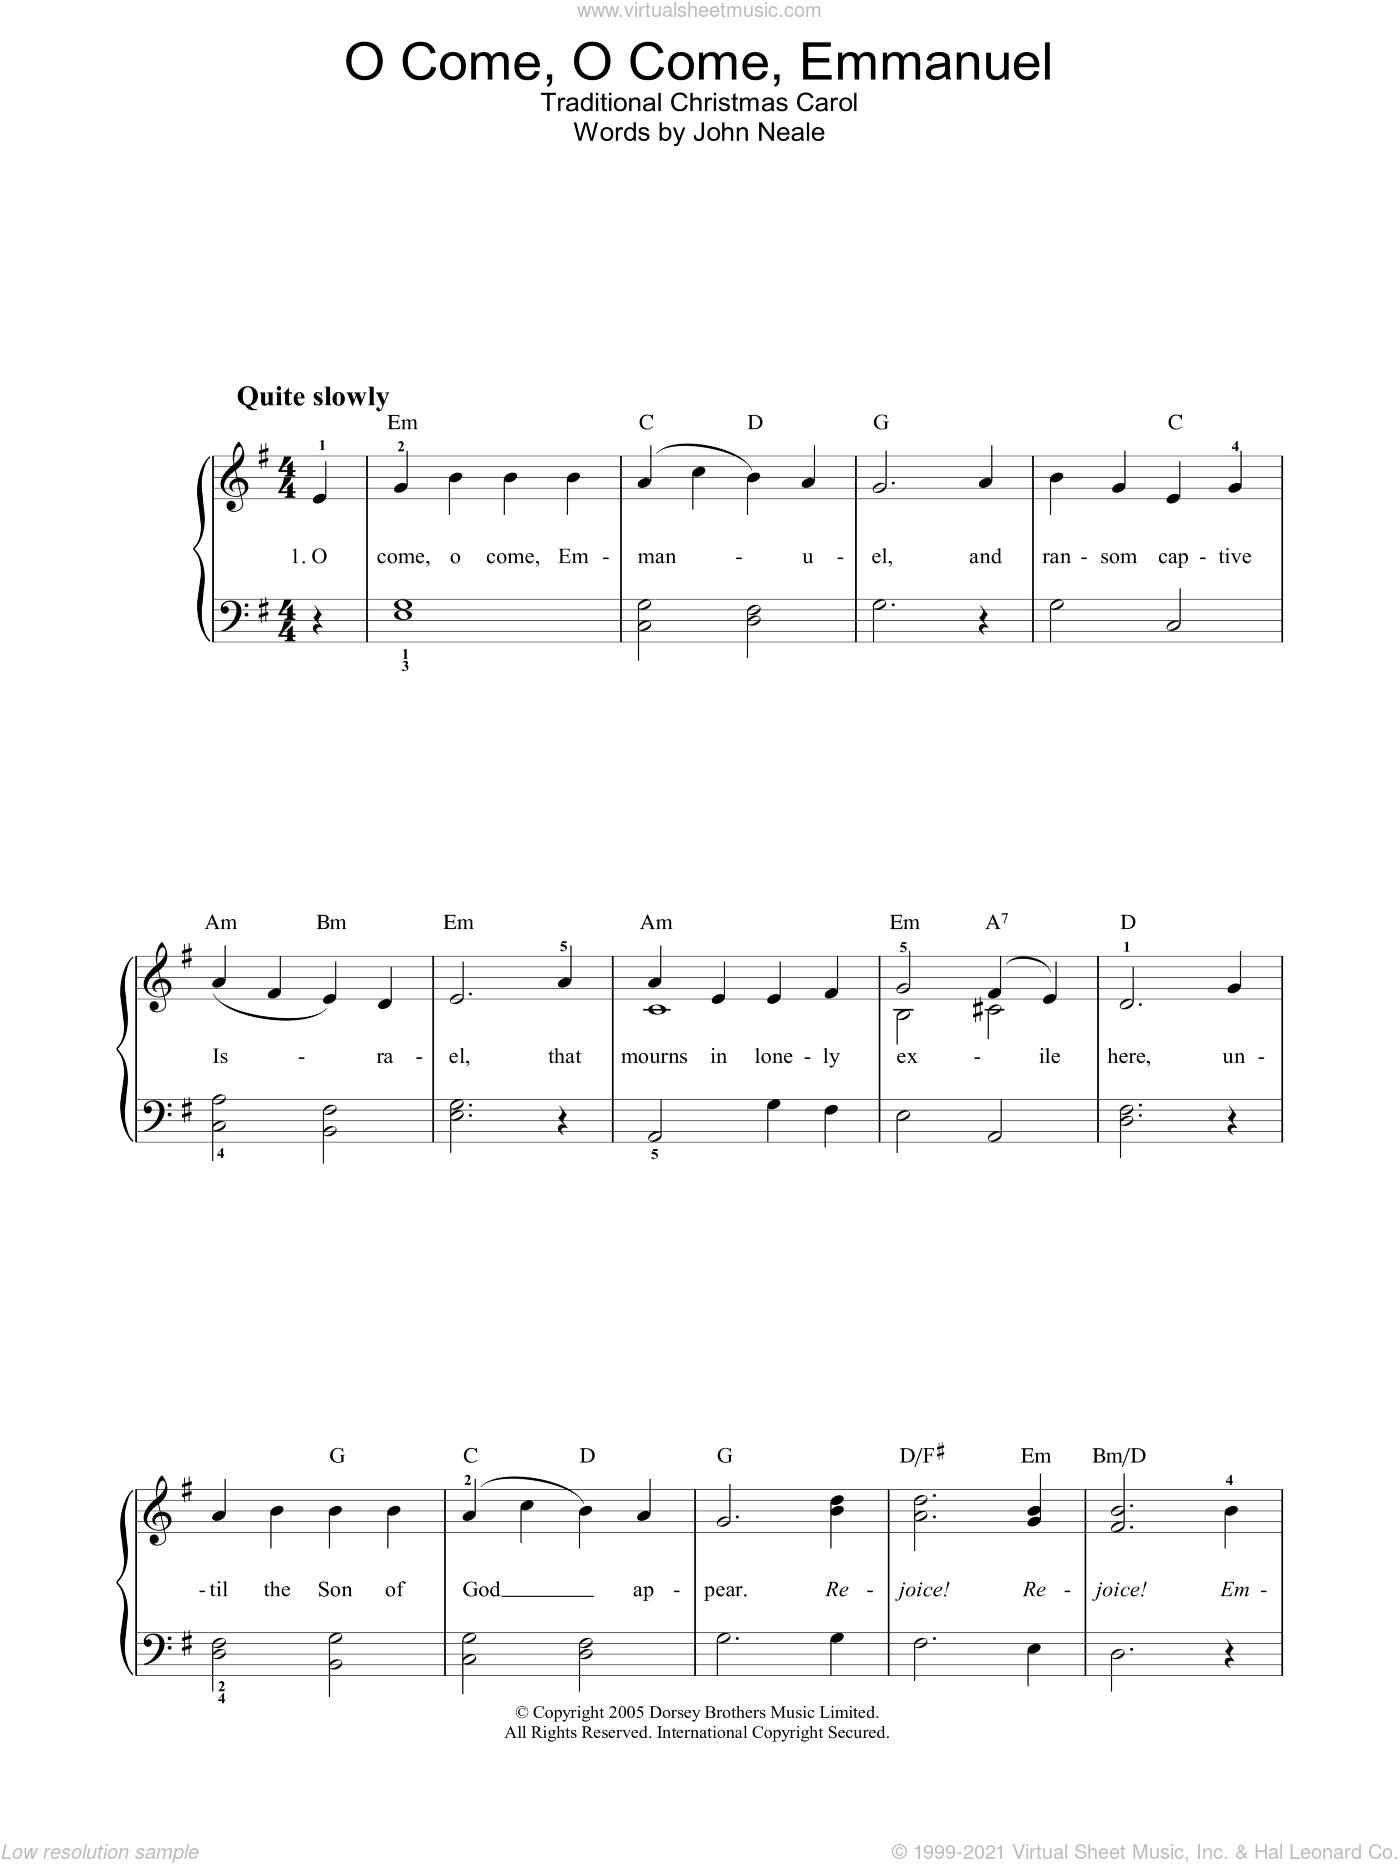 O Come, O Come Emmanuel sheet music for voice, piano or guitar by John Mason Neale and Miscellaneous, intermediate skill level